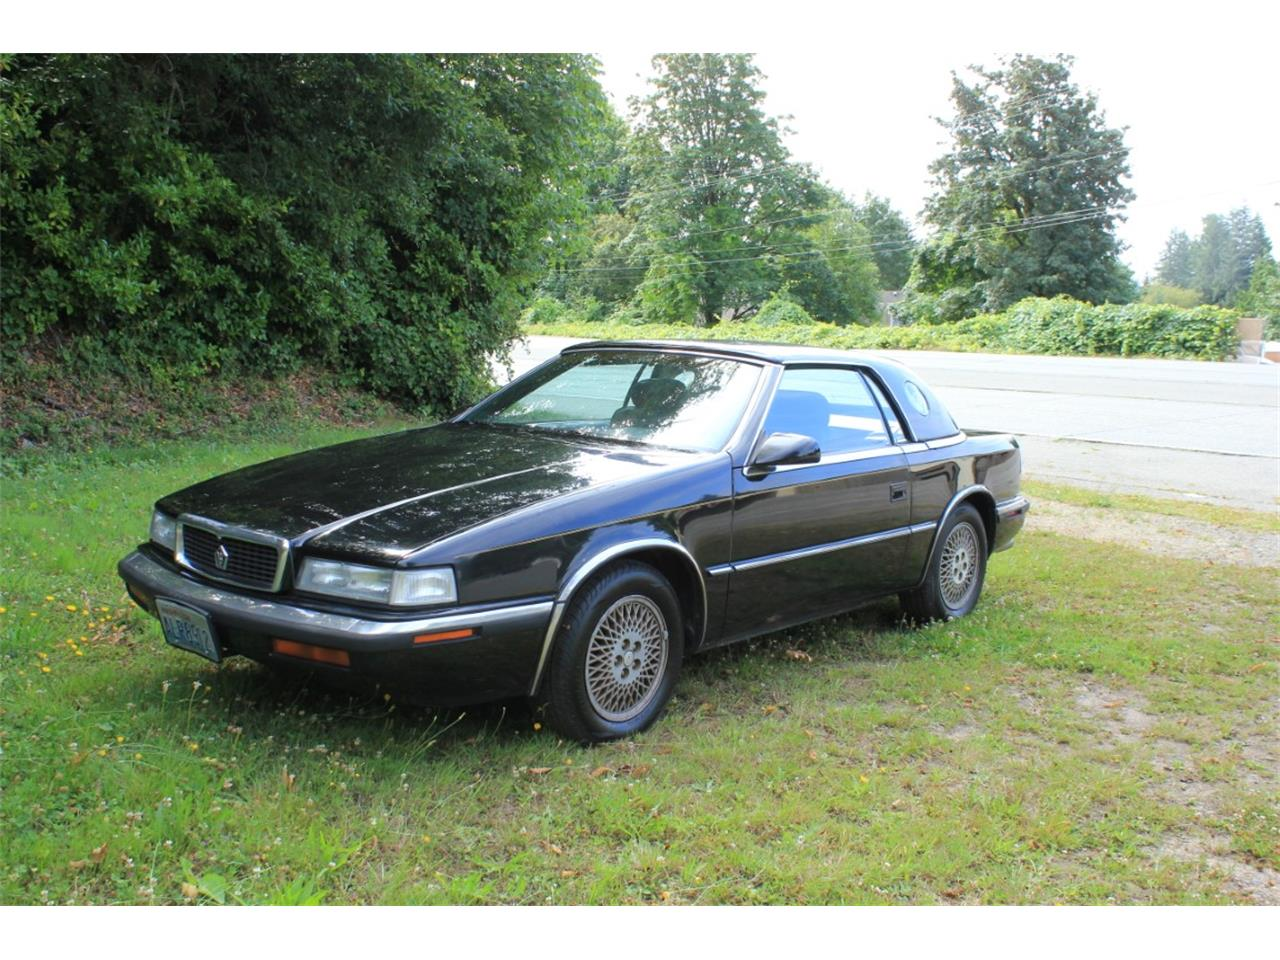 Large Picture of 1990 Chrysler TC by Maserati located in TACOMA Washington Auction Vehicle - QQBD